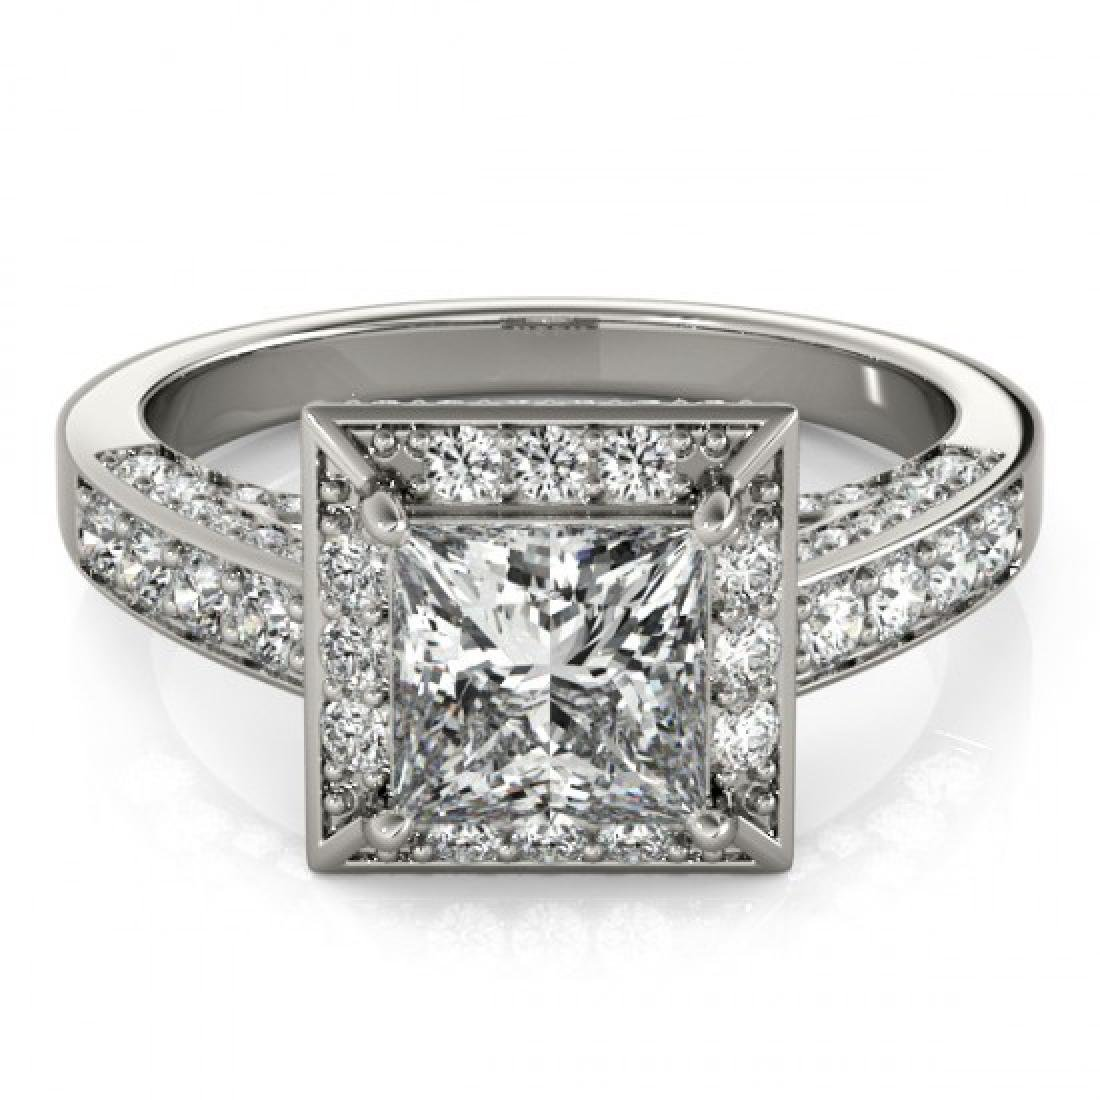 1.5 CTW Certified VS/SI Princess Diamond Solitaire Halo